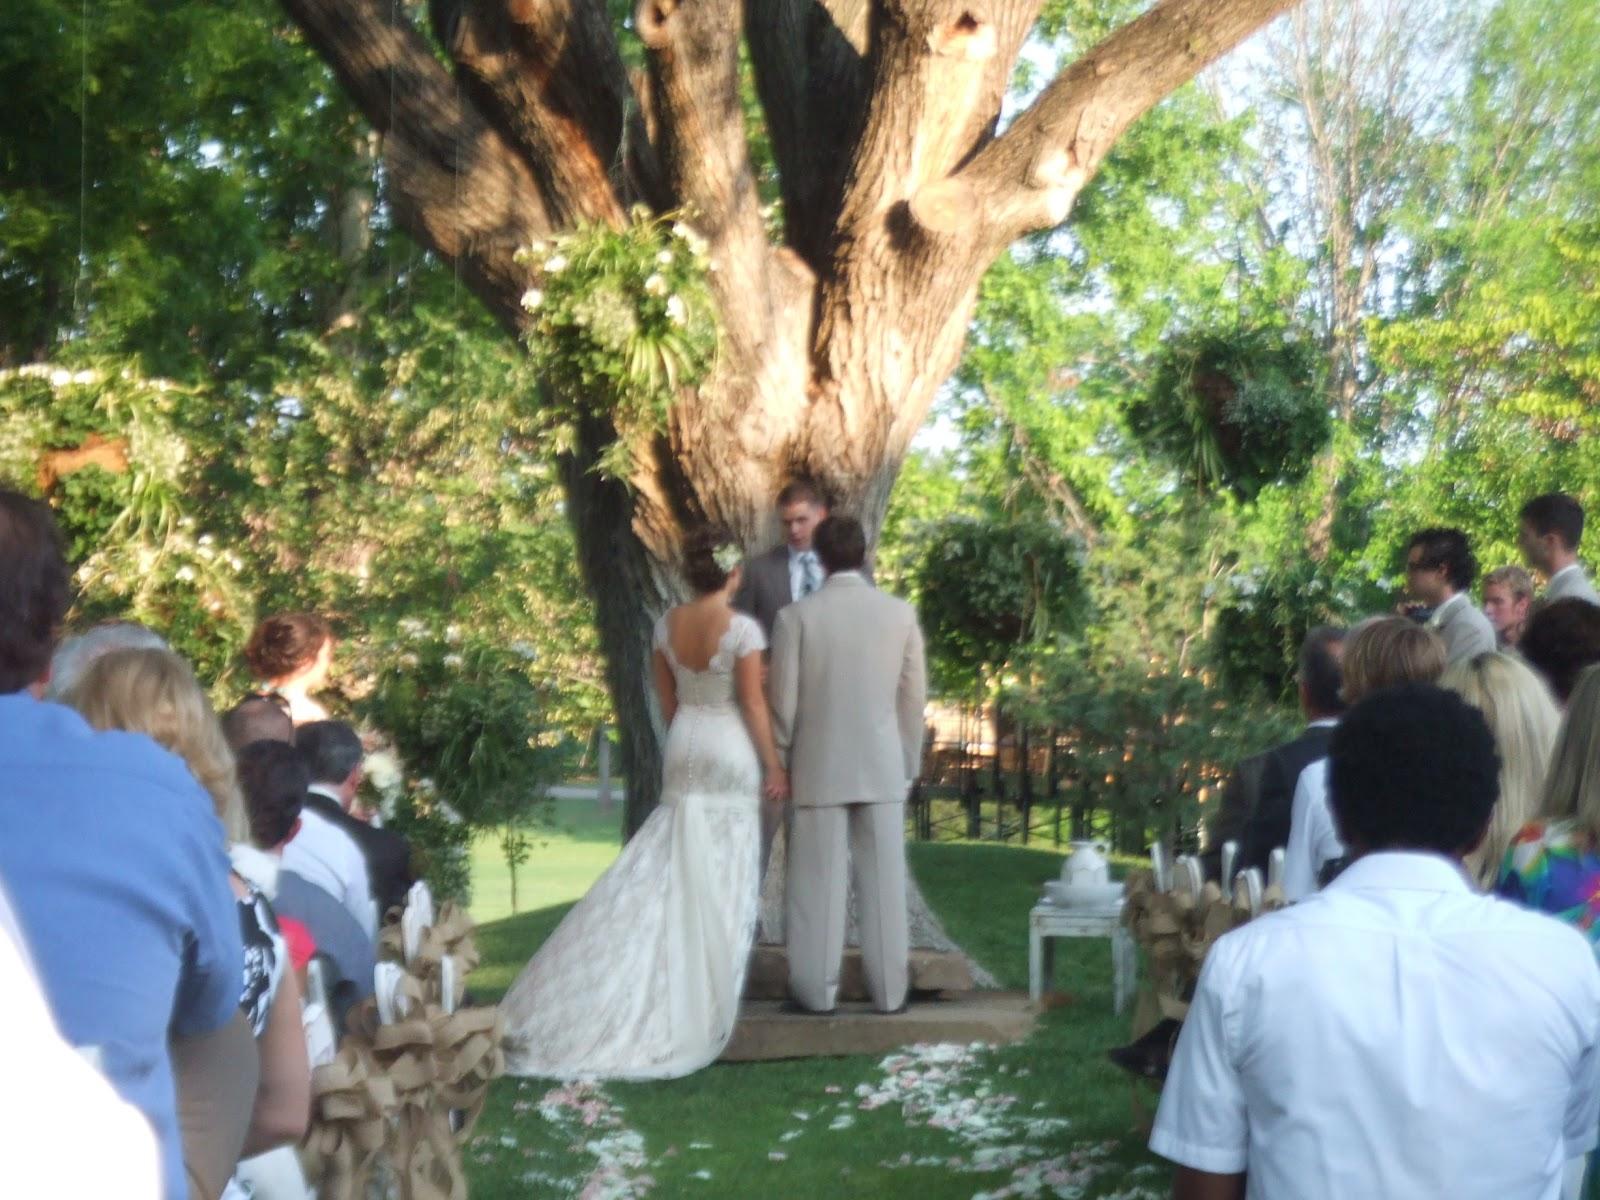 Wawawaughs : ONE OF THE MOST BEAUTIFUL BACKYARD WEDDINGS...